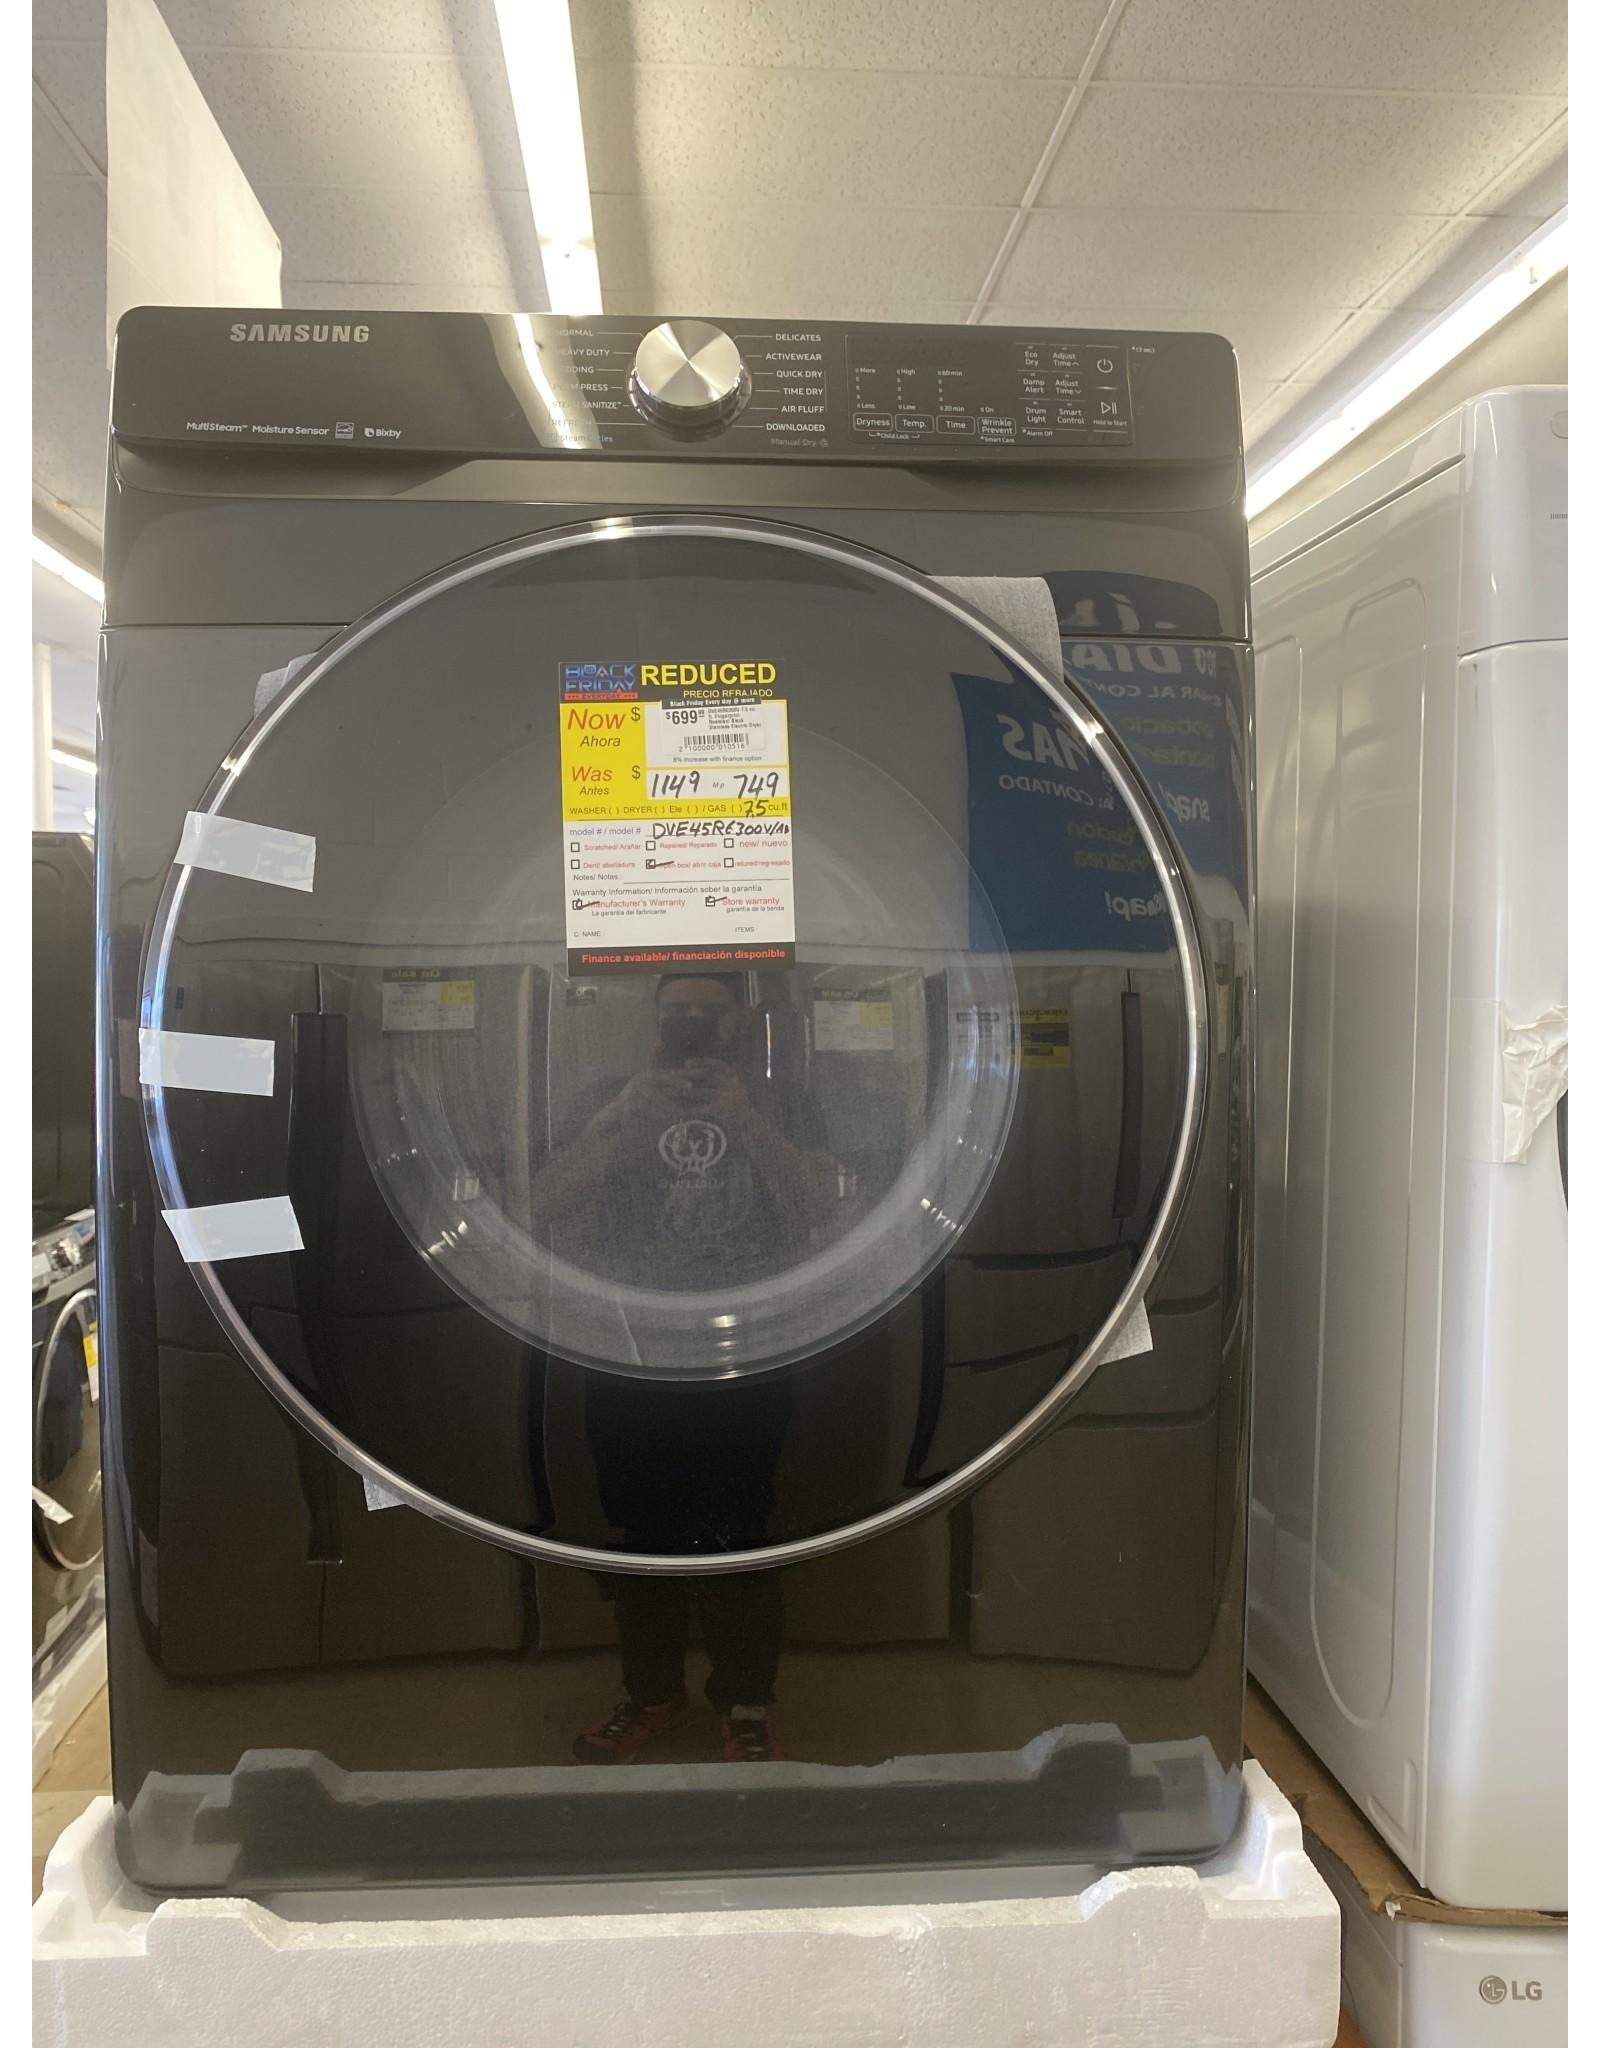 SAMSUNG DVE45R6300V 7.5 cu. ft. Fingerprint Resistant Black Stainless Electric Dryer with Steam Sanitize+, ENERGY STAR